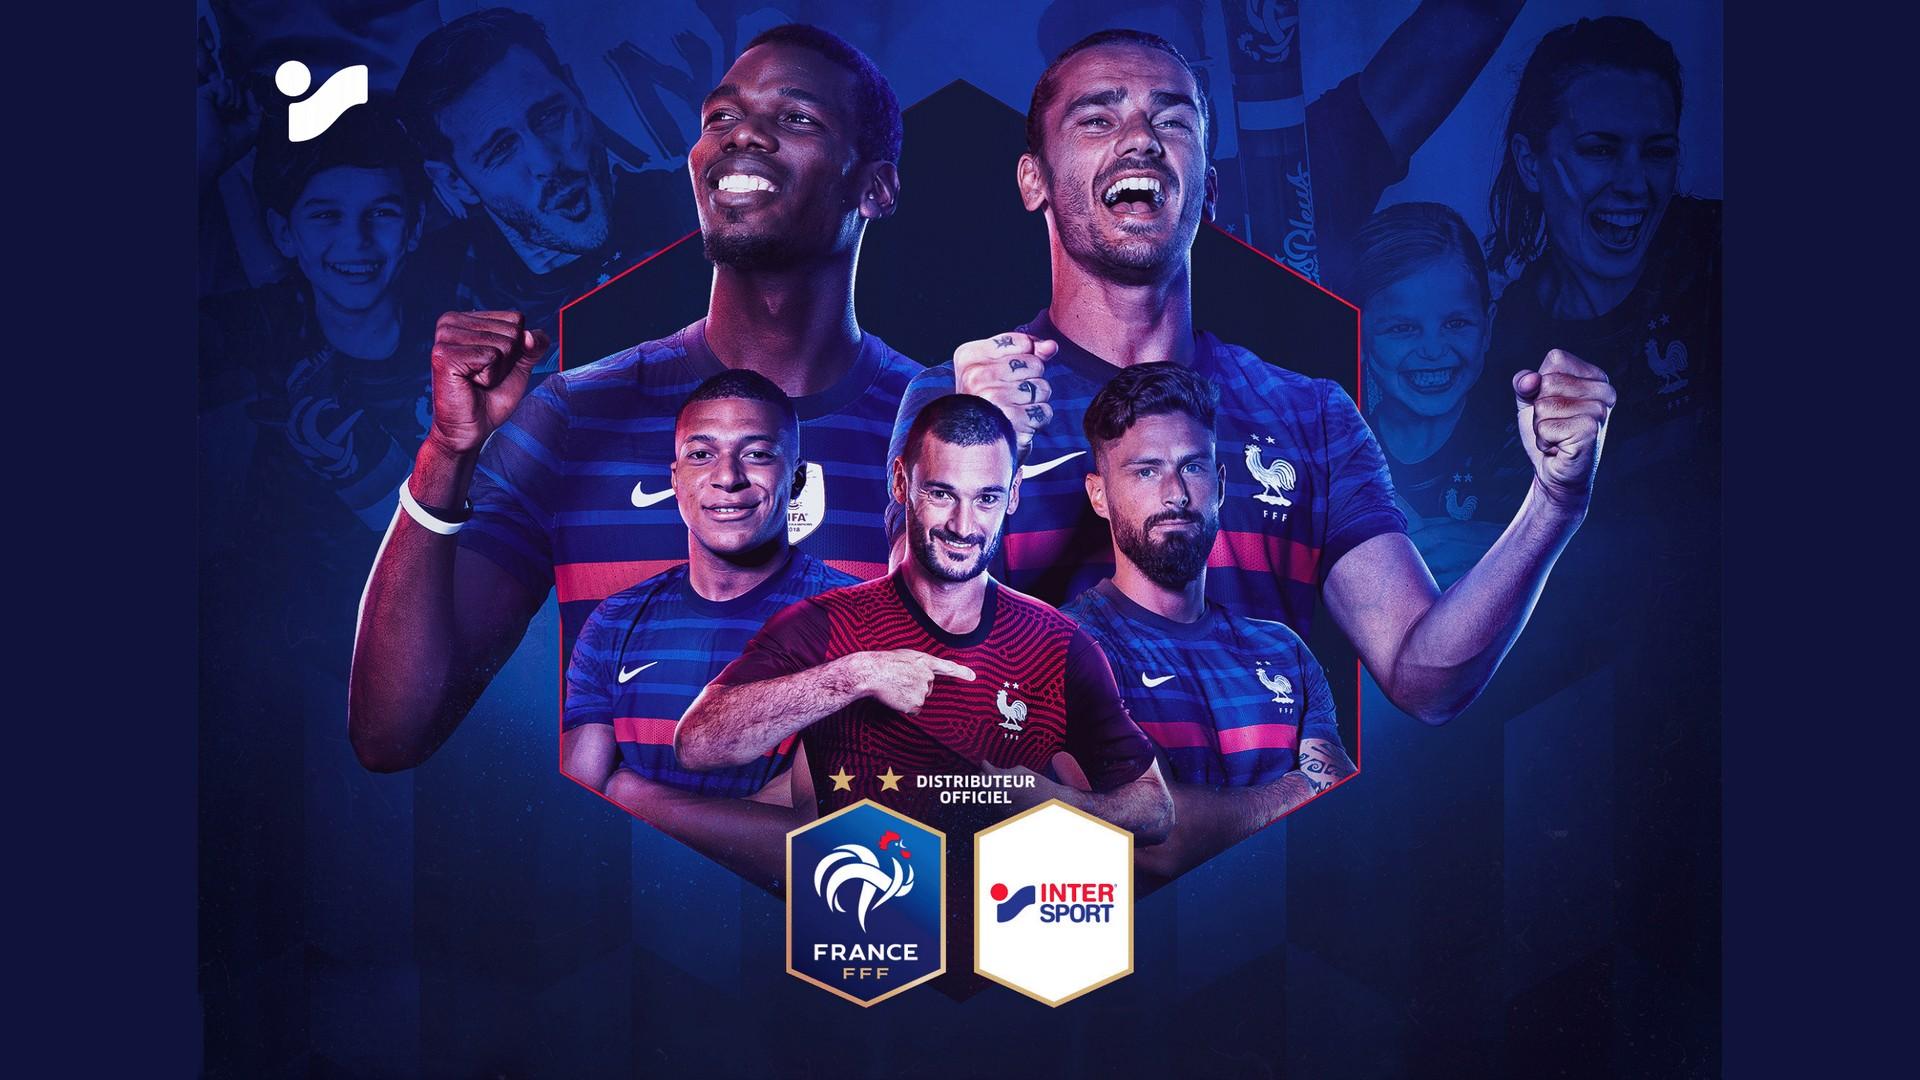 Intermarché x FFF (football) 2021